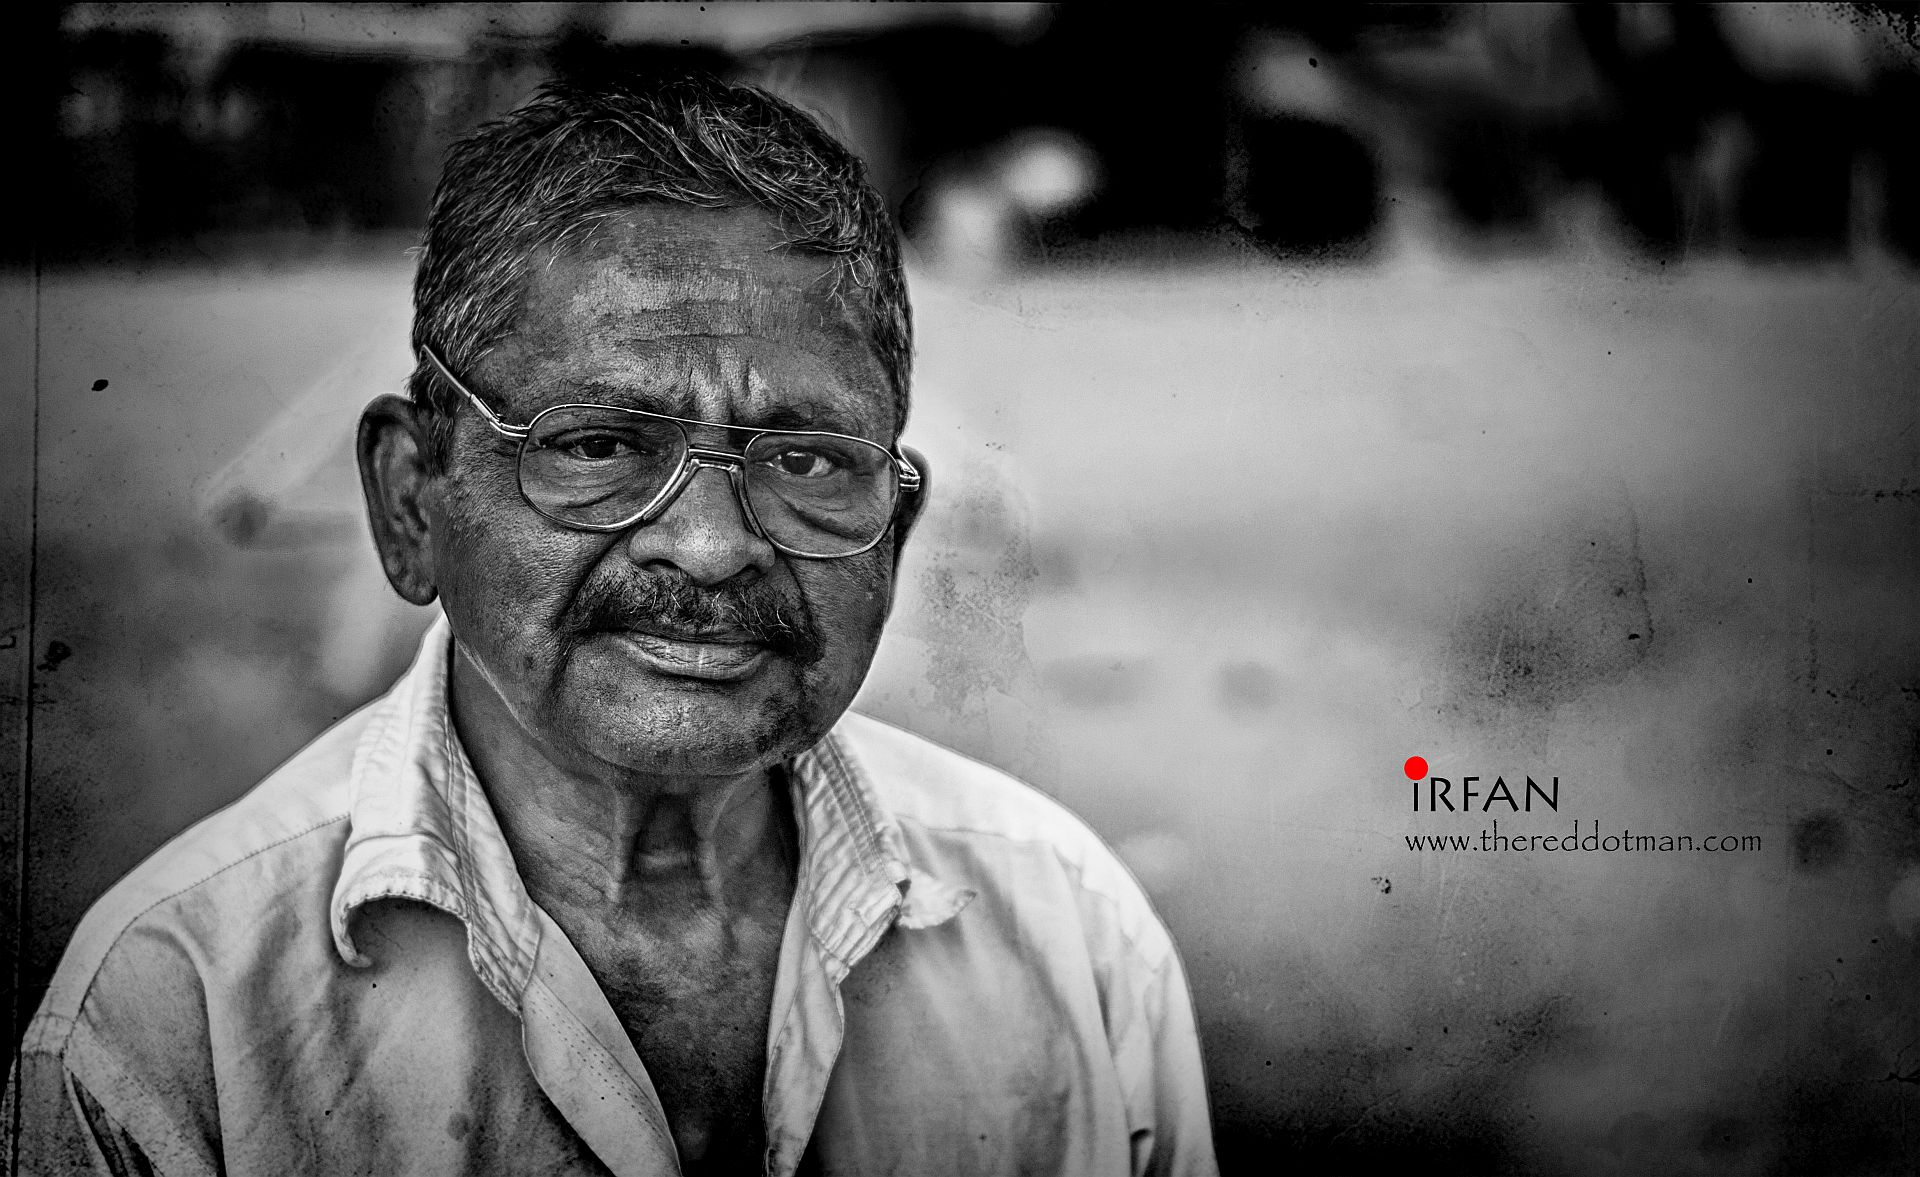 fortune teller, besant nagar, beach, black and white, portraits, irfan hussain, thereddotman, irfan, hussain